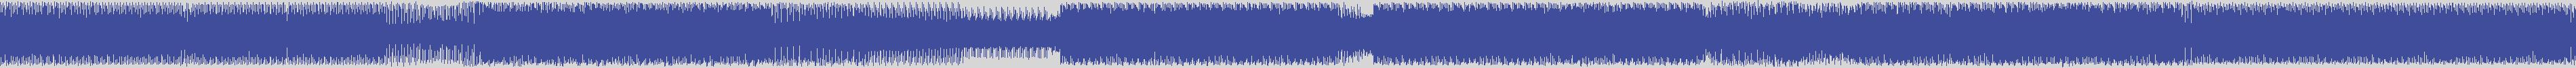 just_digital_records [JS1321] Bardini Experience - Ninetyseventyone [Techno Mix] audio wave form